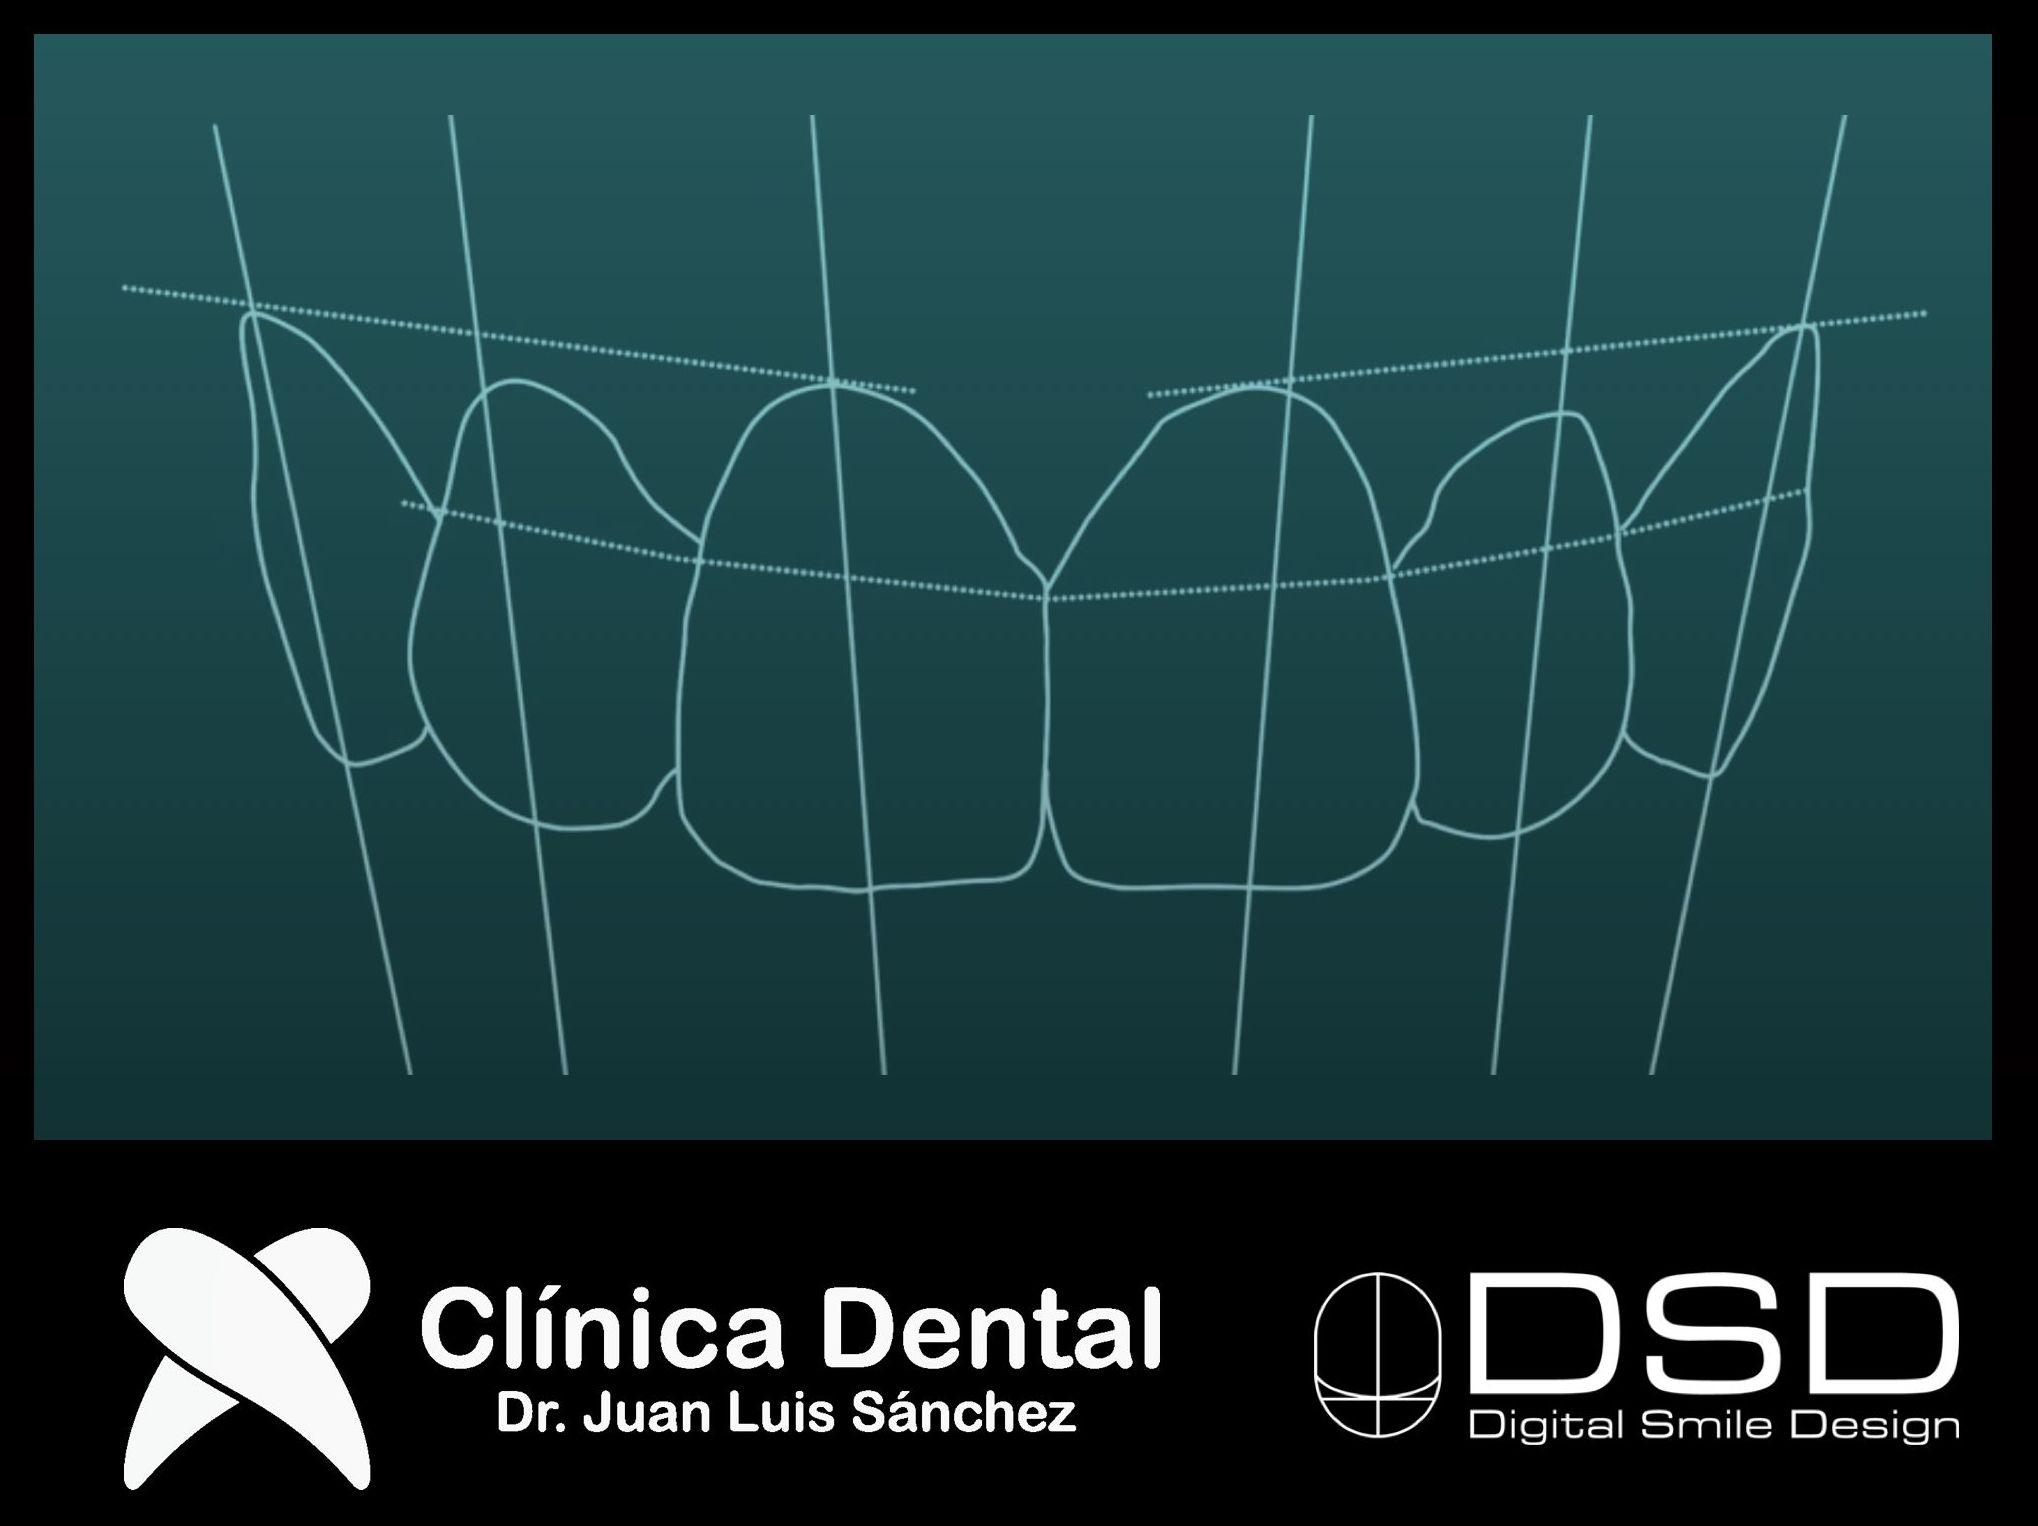 Estética dental : Especialidades de Clínica Dental Dr. Juan Luis Sánchez